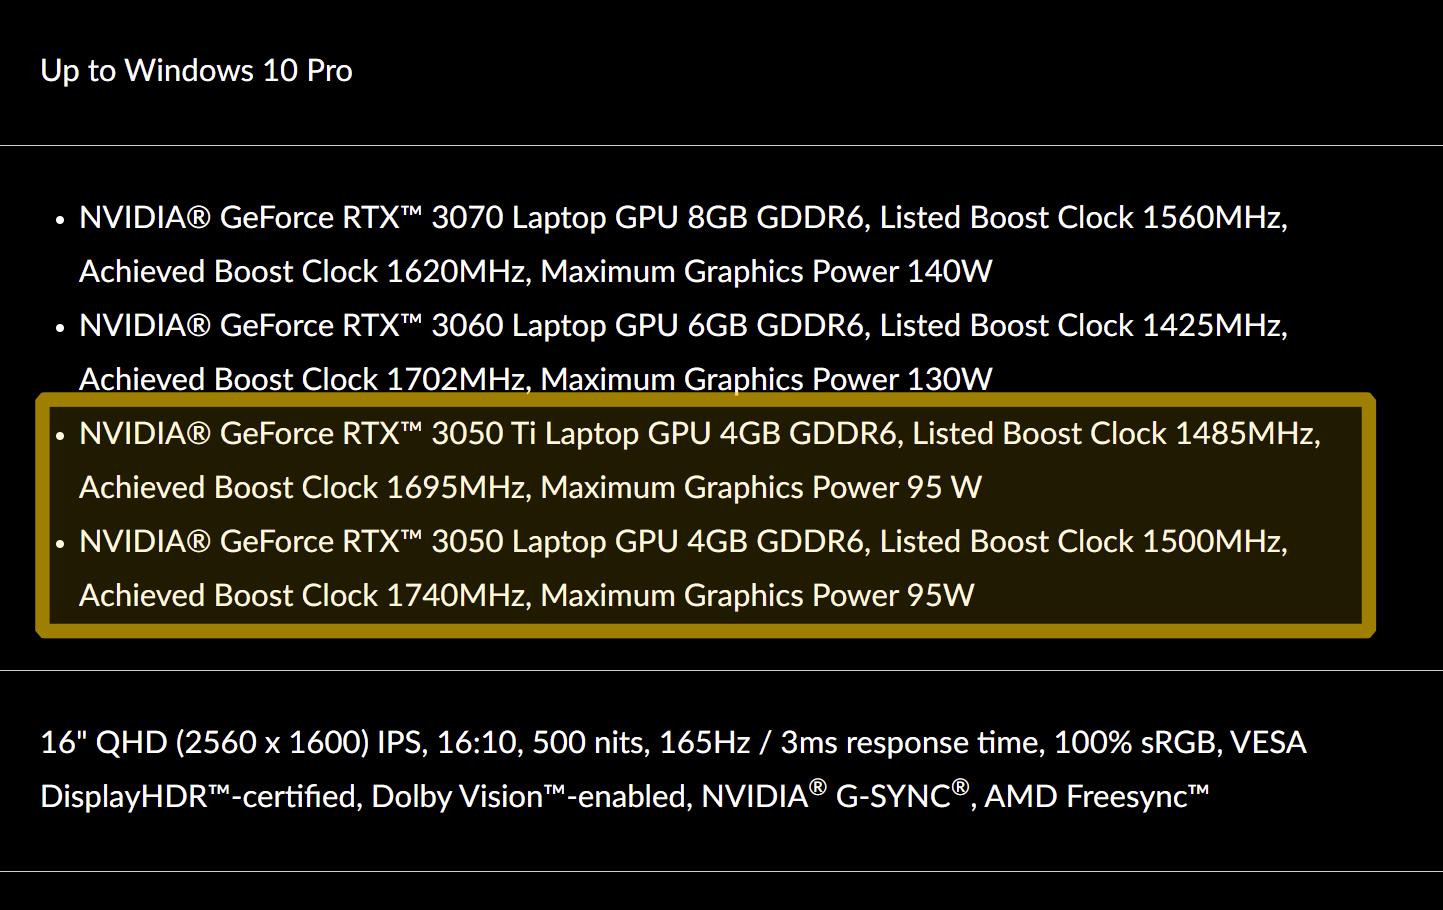 LENOVO confirms GeForce RTX 3050 Ti and RTX 3050 Laptop GPUs TGP and clocks – VideoCardz.com